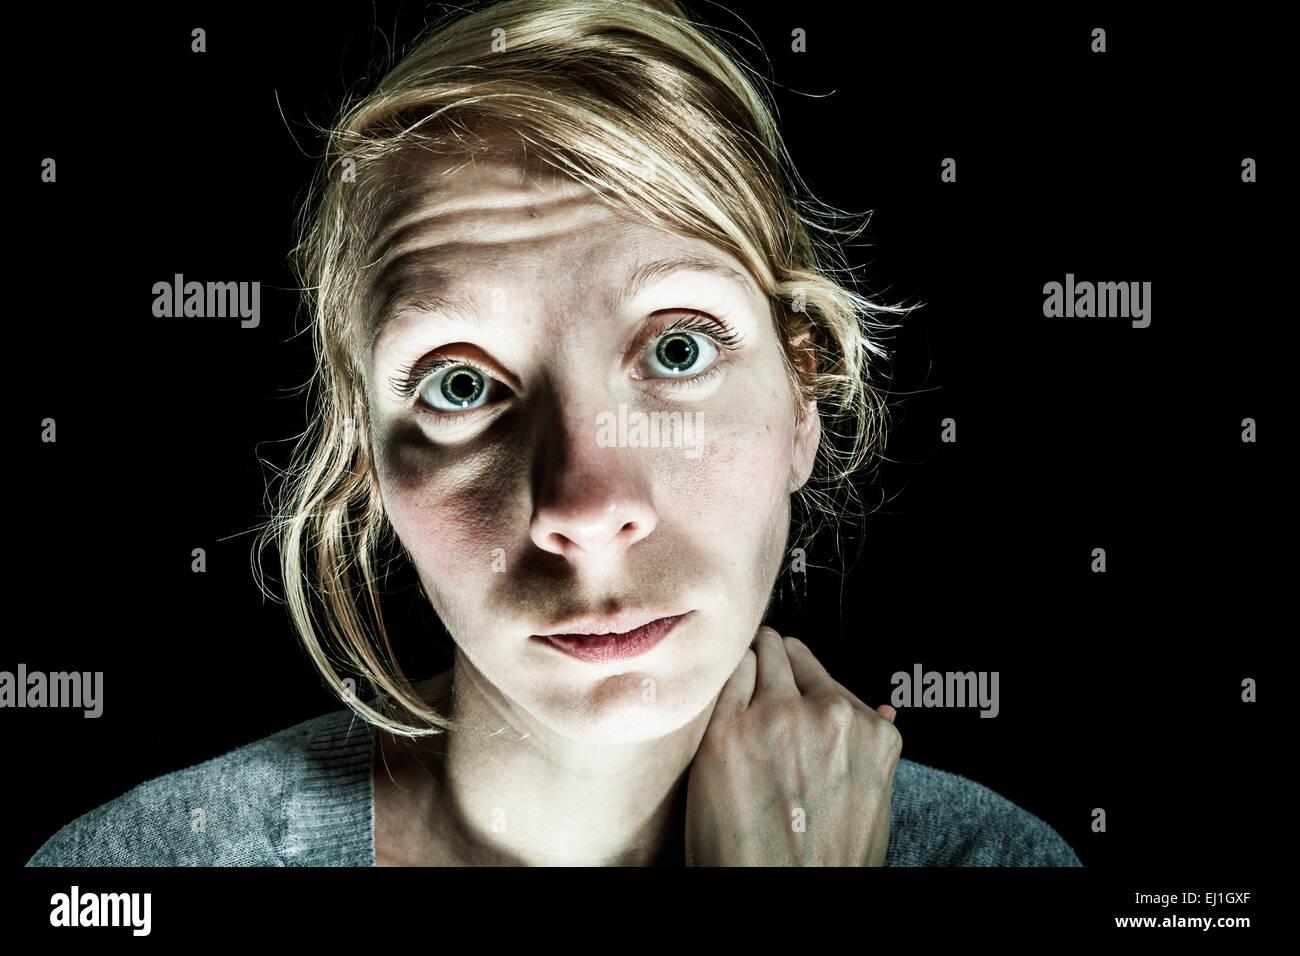 Insomniac Sad and Hopelessness Woman needing Help - Isolated on Black - Stock Image